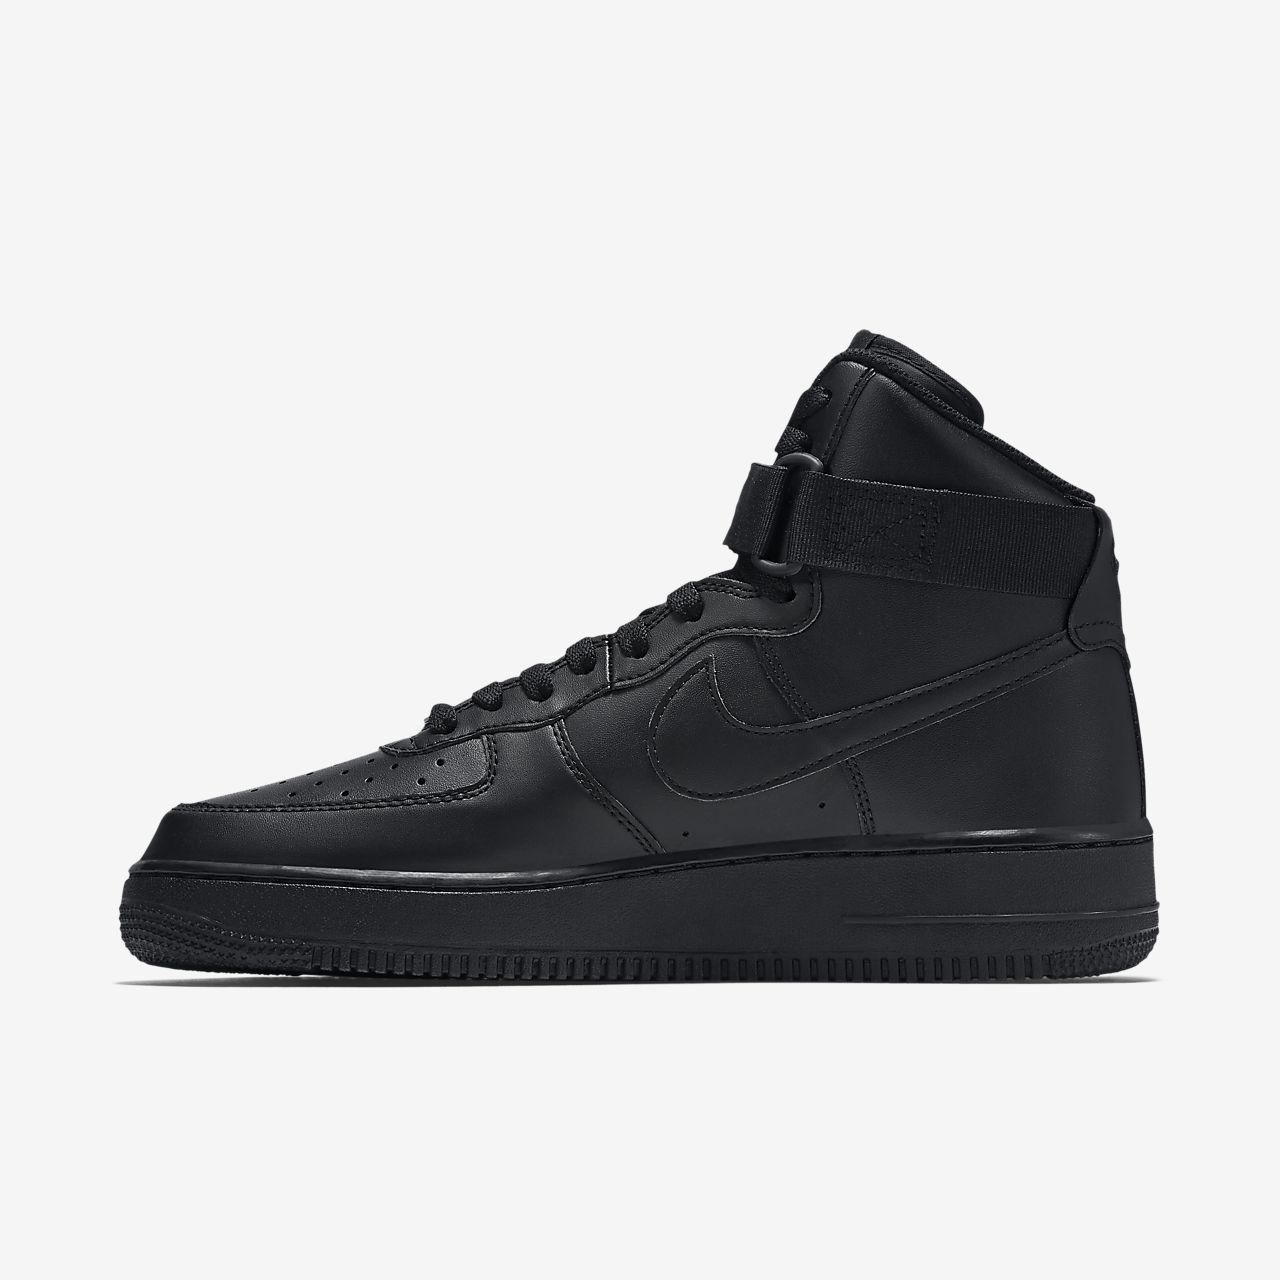 1280x1280 Nike Air Force 1 High 07 Men's Shoe.